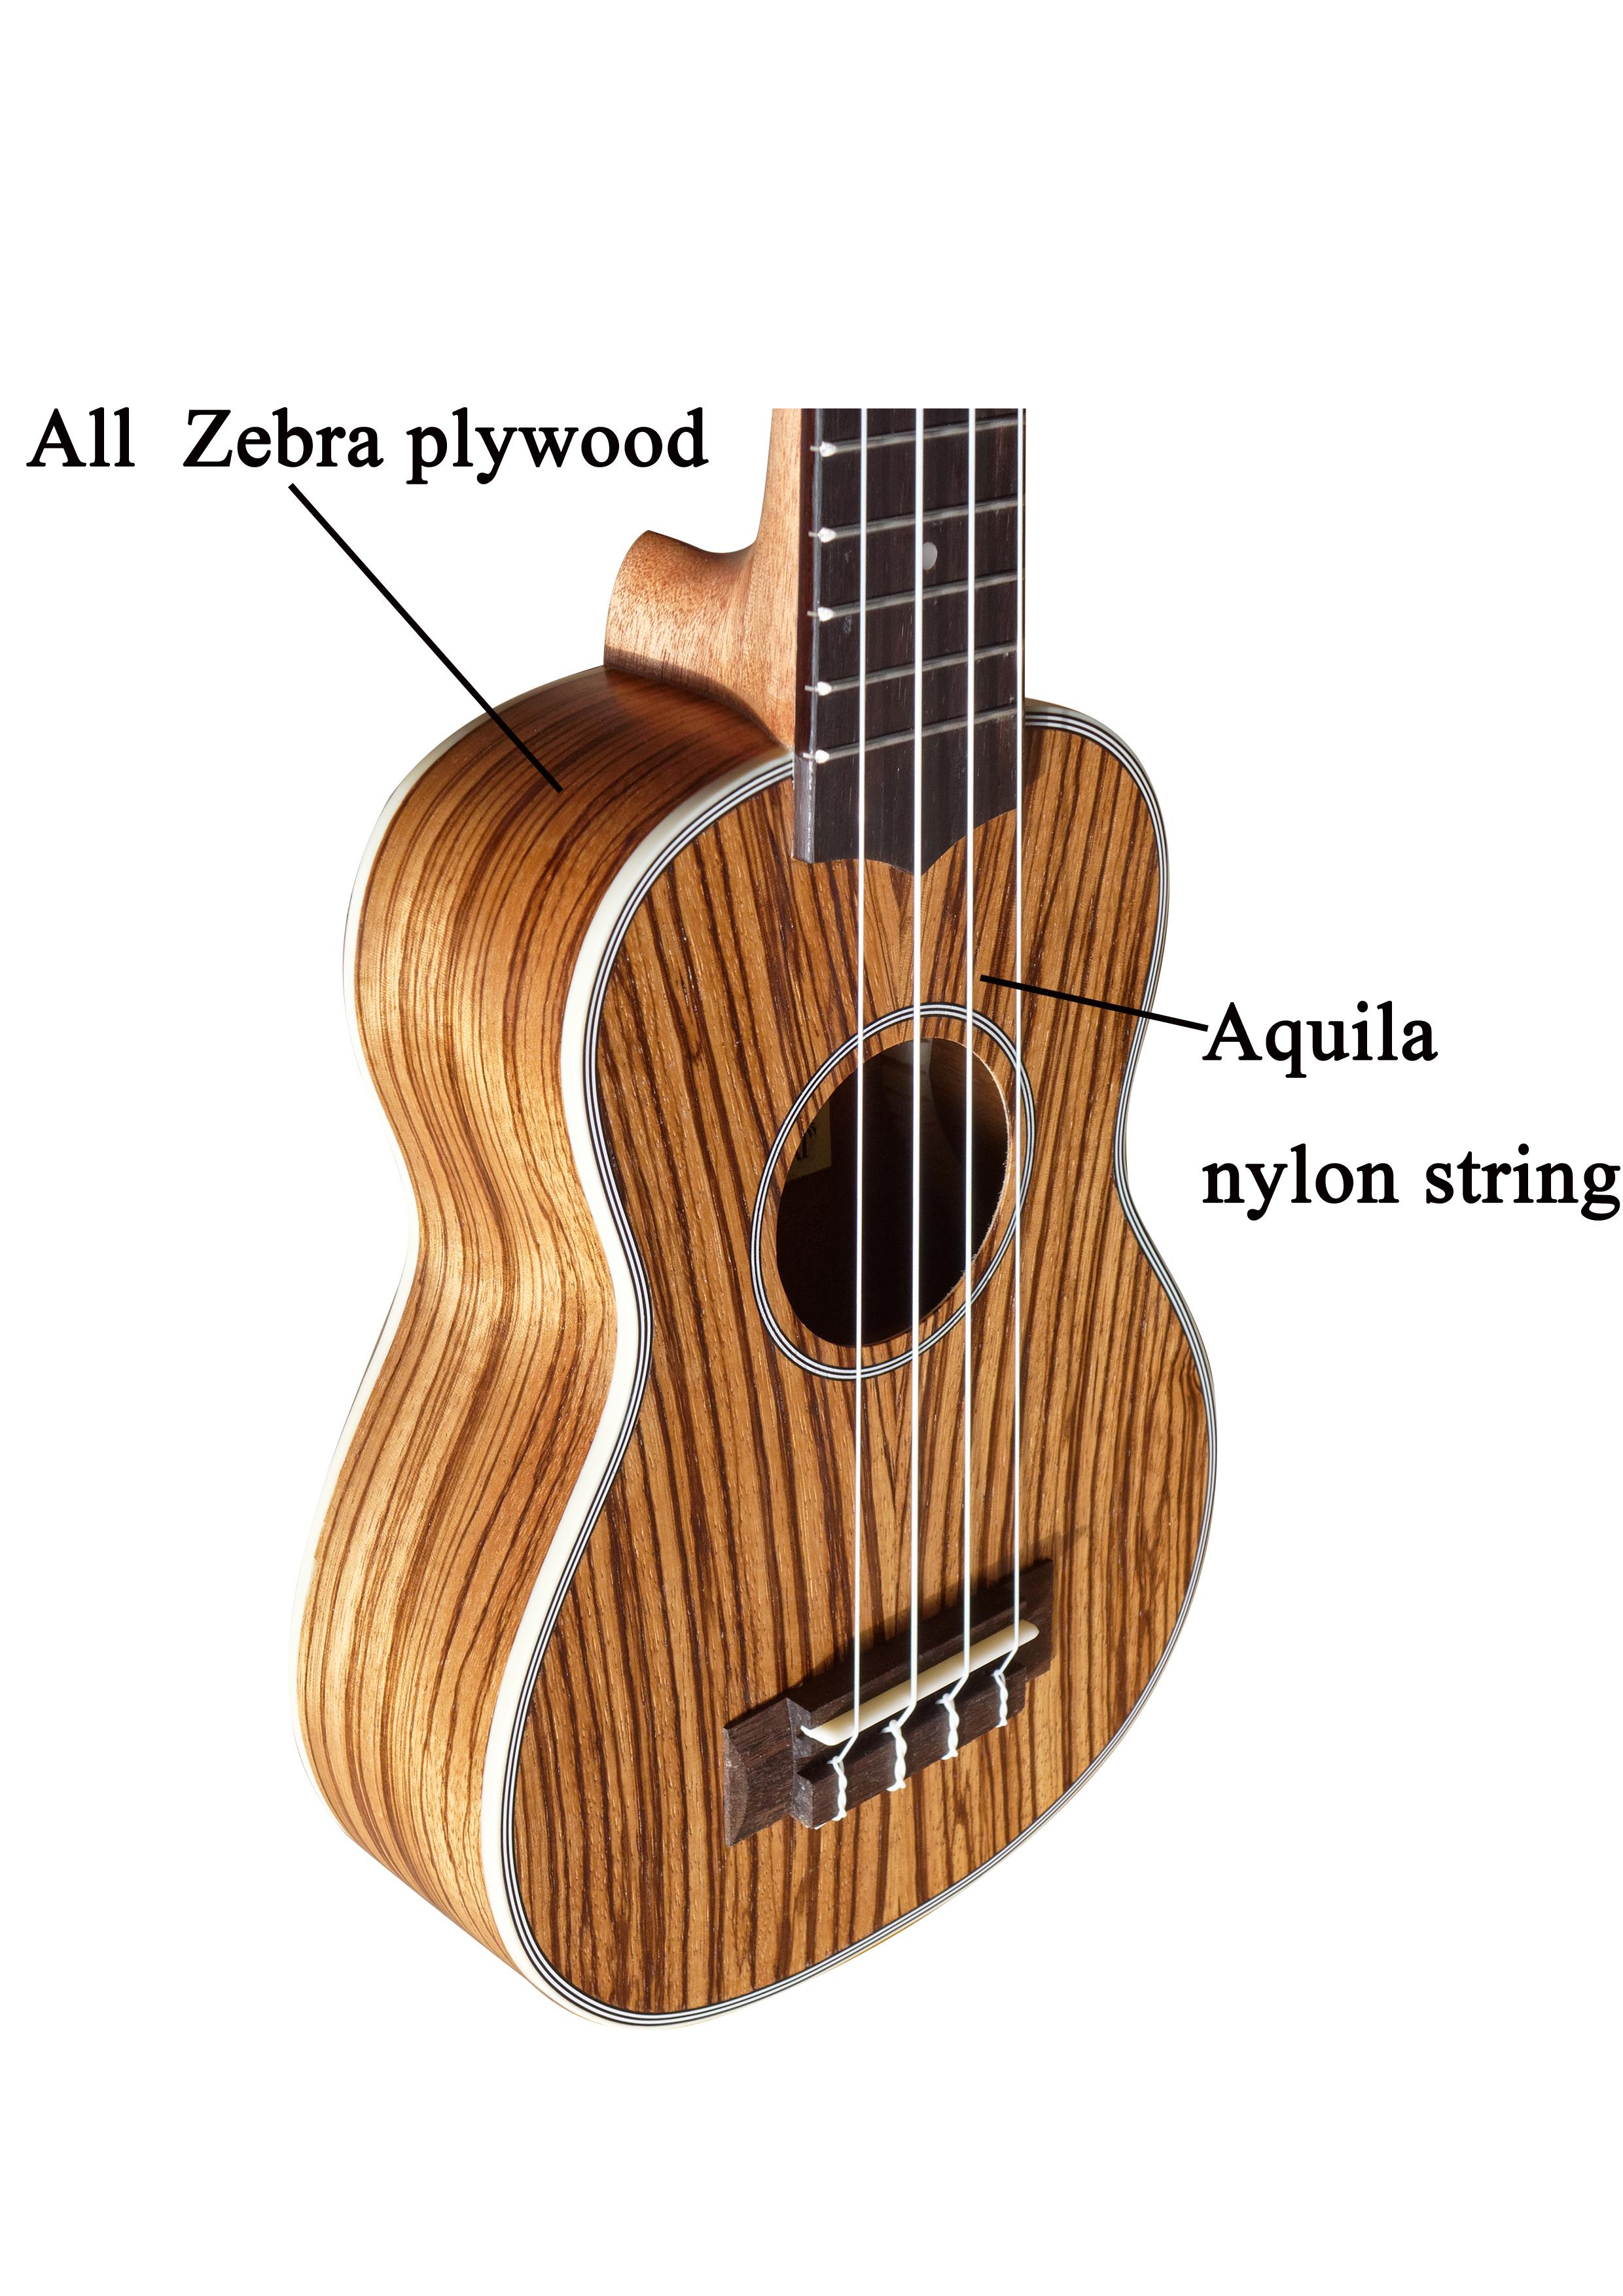 24 Inch Concert Ukelele Alle Zebrawood Hoogglans Kwaliteit Nylon Strings Ukulele S-249/N